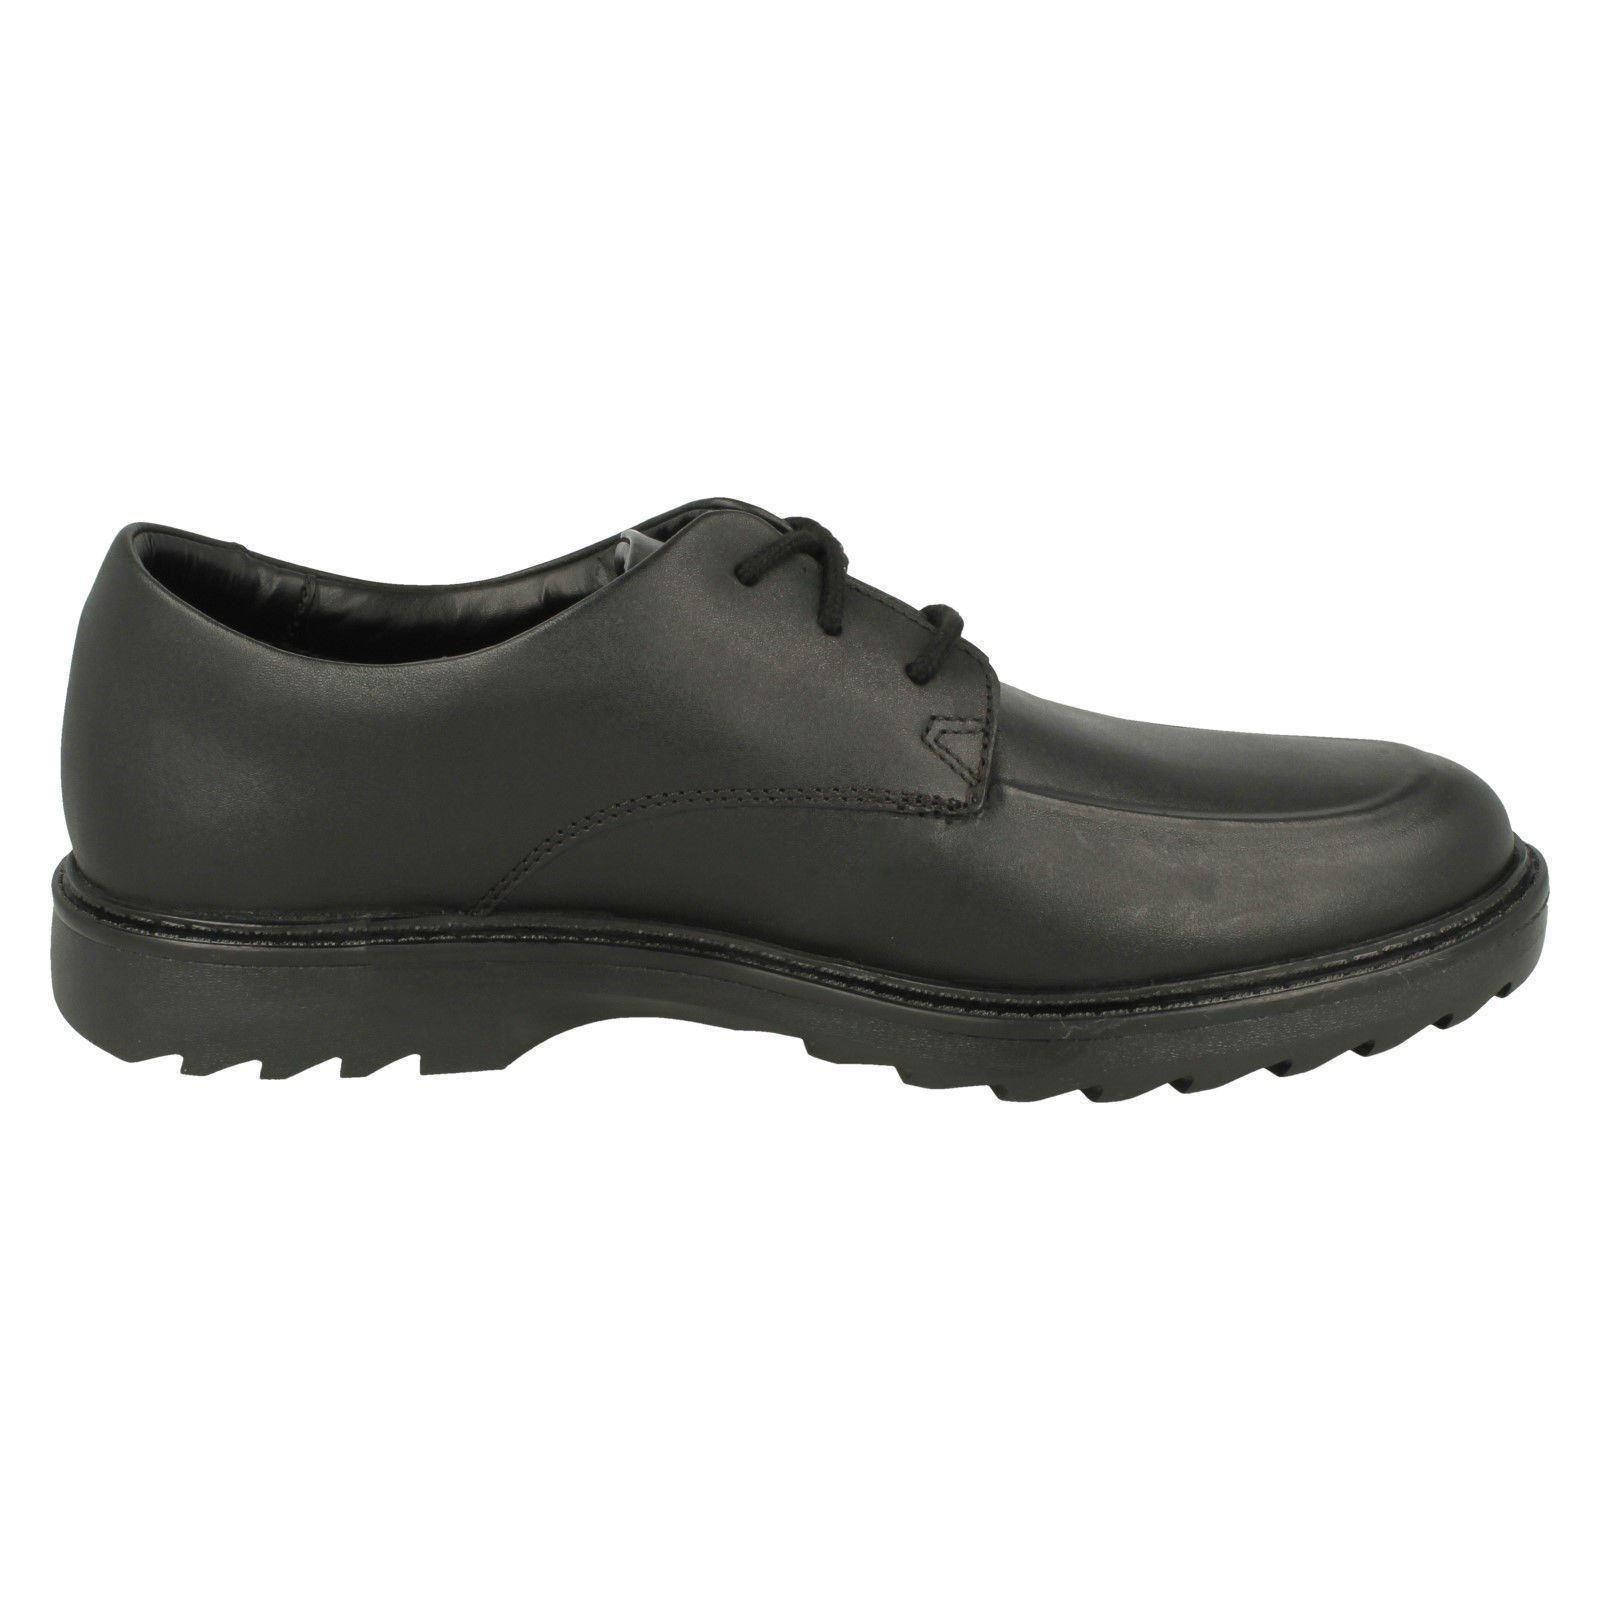 'asher negros cordones con de Zapatos Clarks Grove' Clarks formales niño xqX7f0Hzw